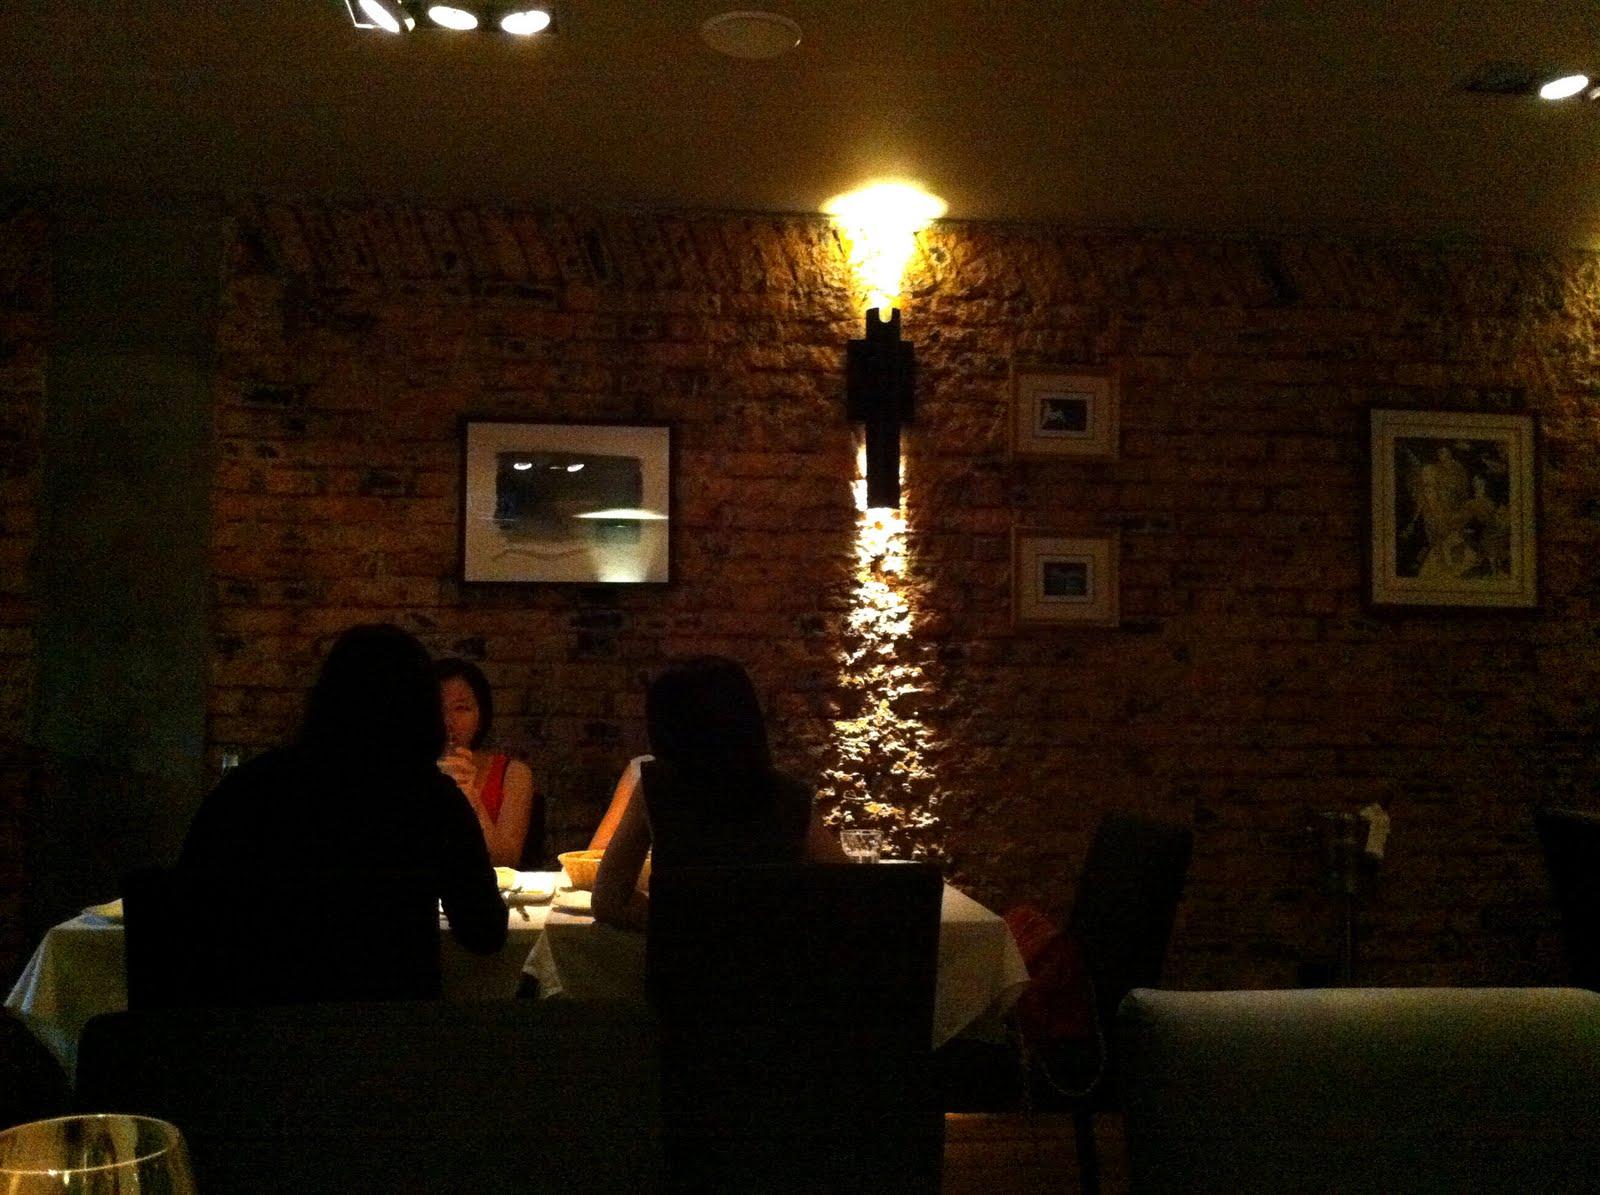 Stephie 39 s blog leonardo 39 s dining room bangsar for Leonardo s dining room